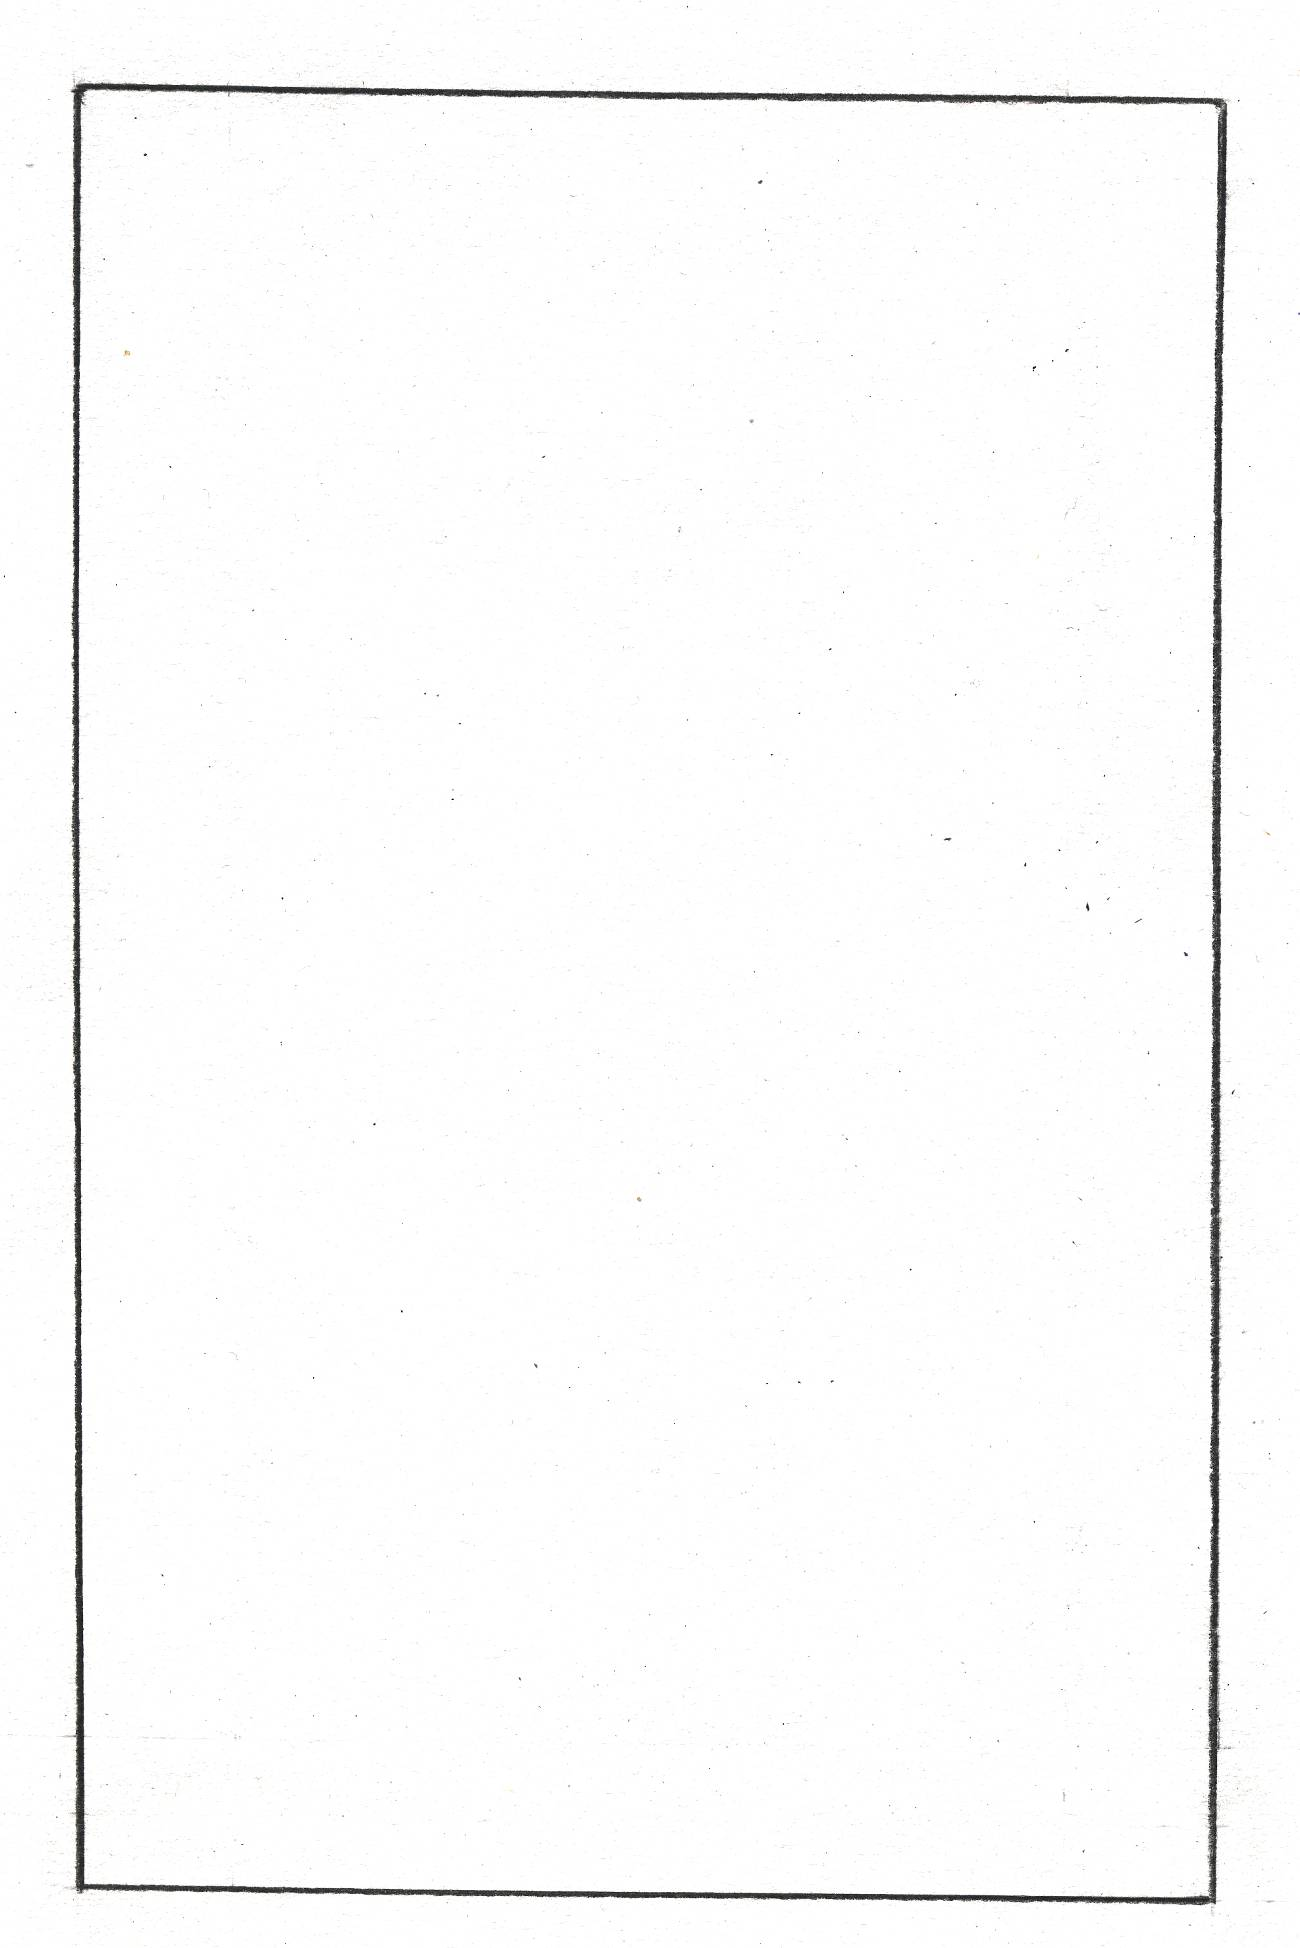 http://lib.convdocs.org/pars_docs/refs/89/88668/88668_html_191889aa.jpg